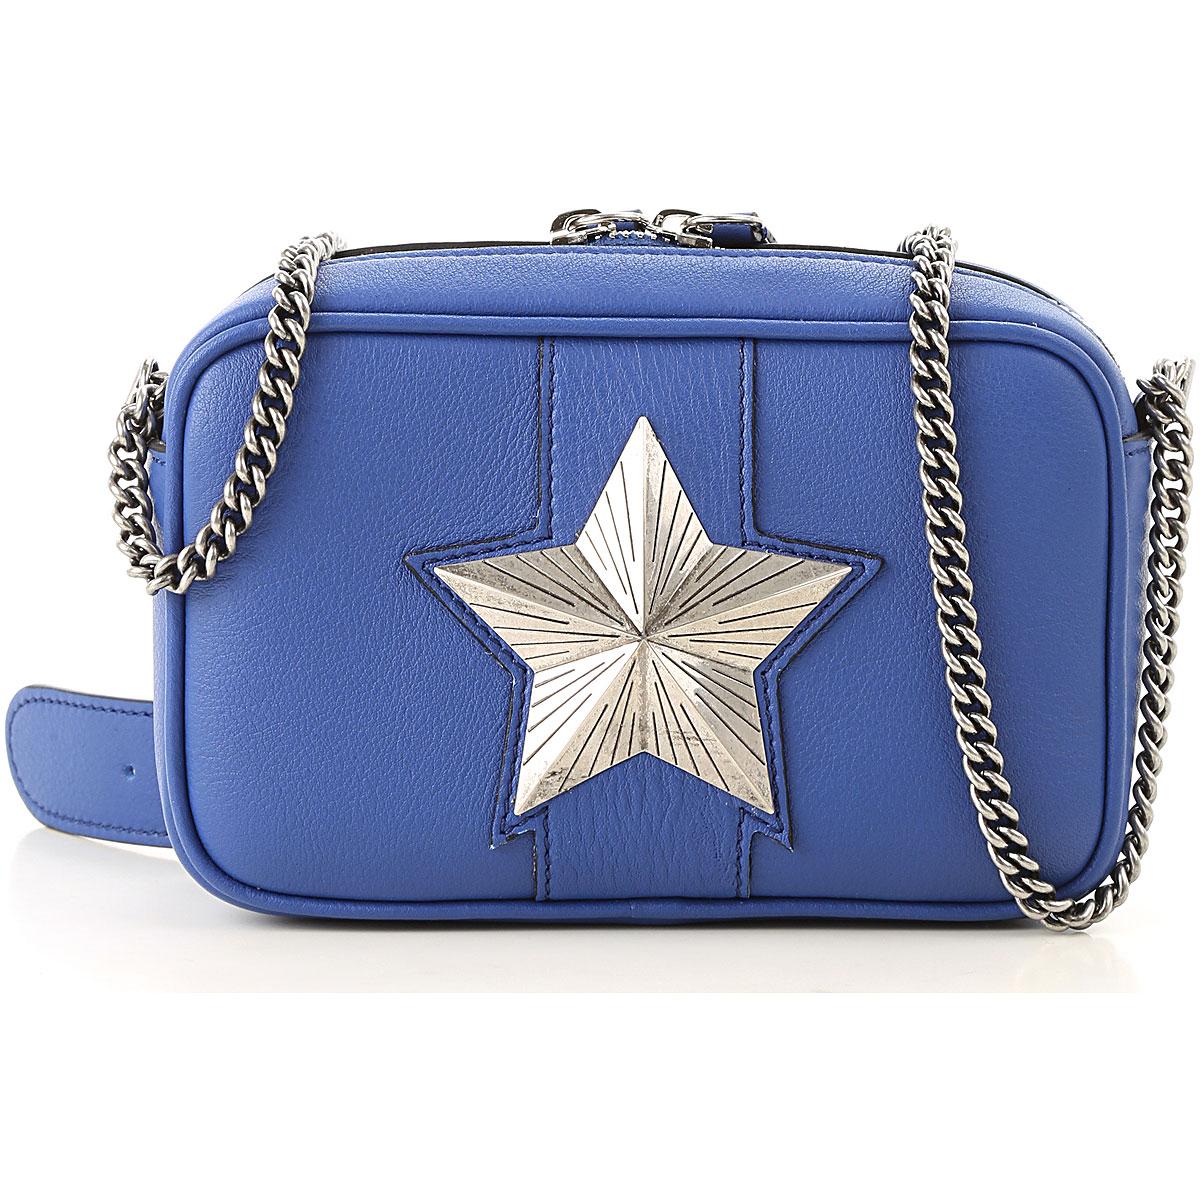 Image of Les Jeunes Etoiles Shoulder Bag for Women, Vega, Blue, Leather, 2017